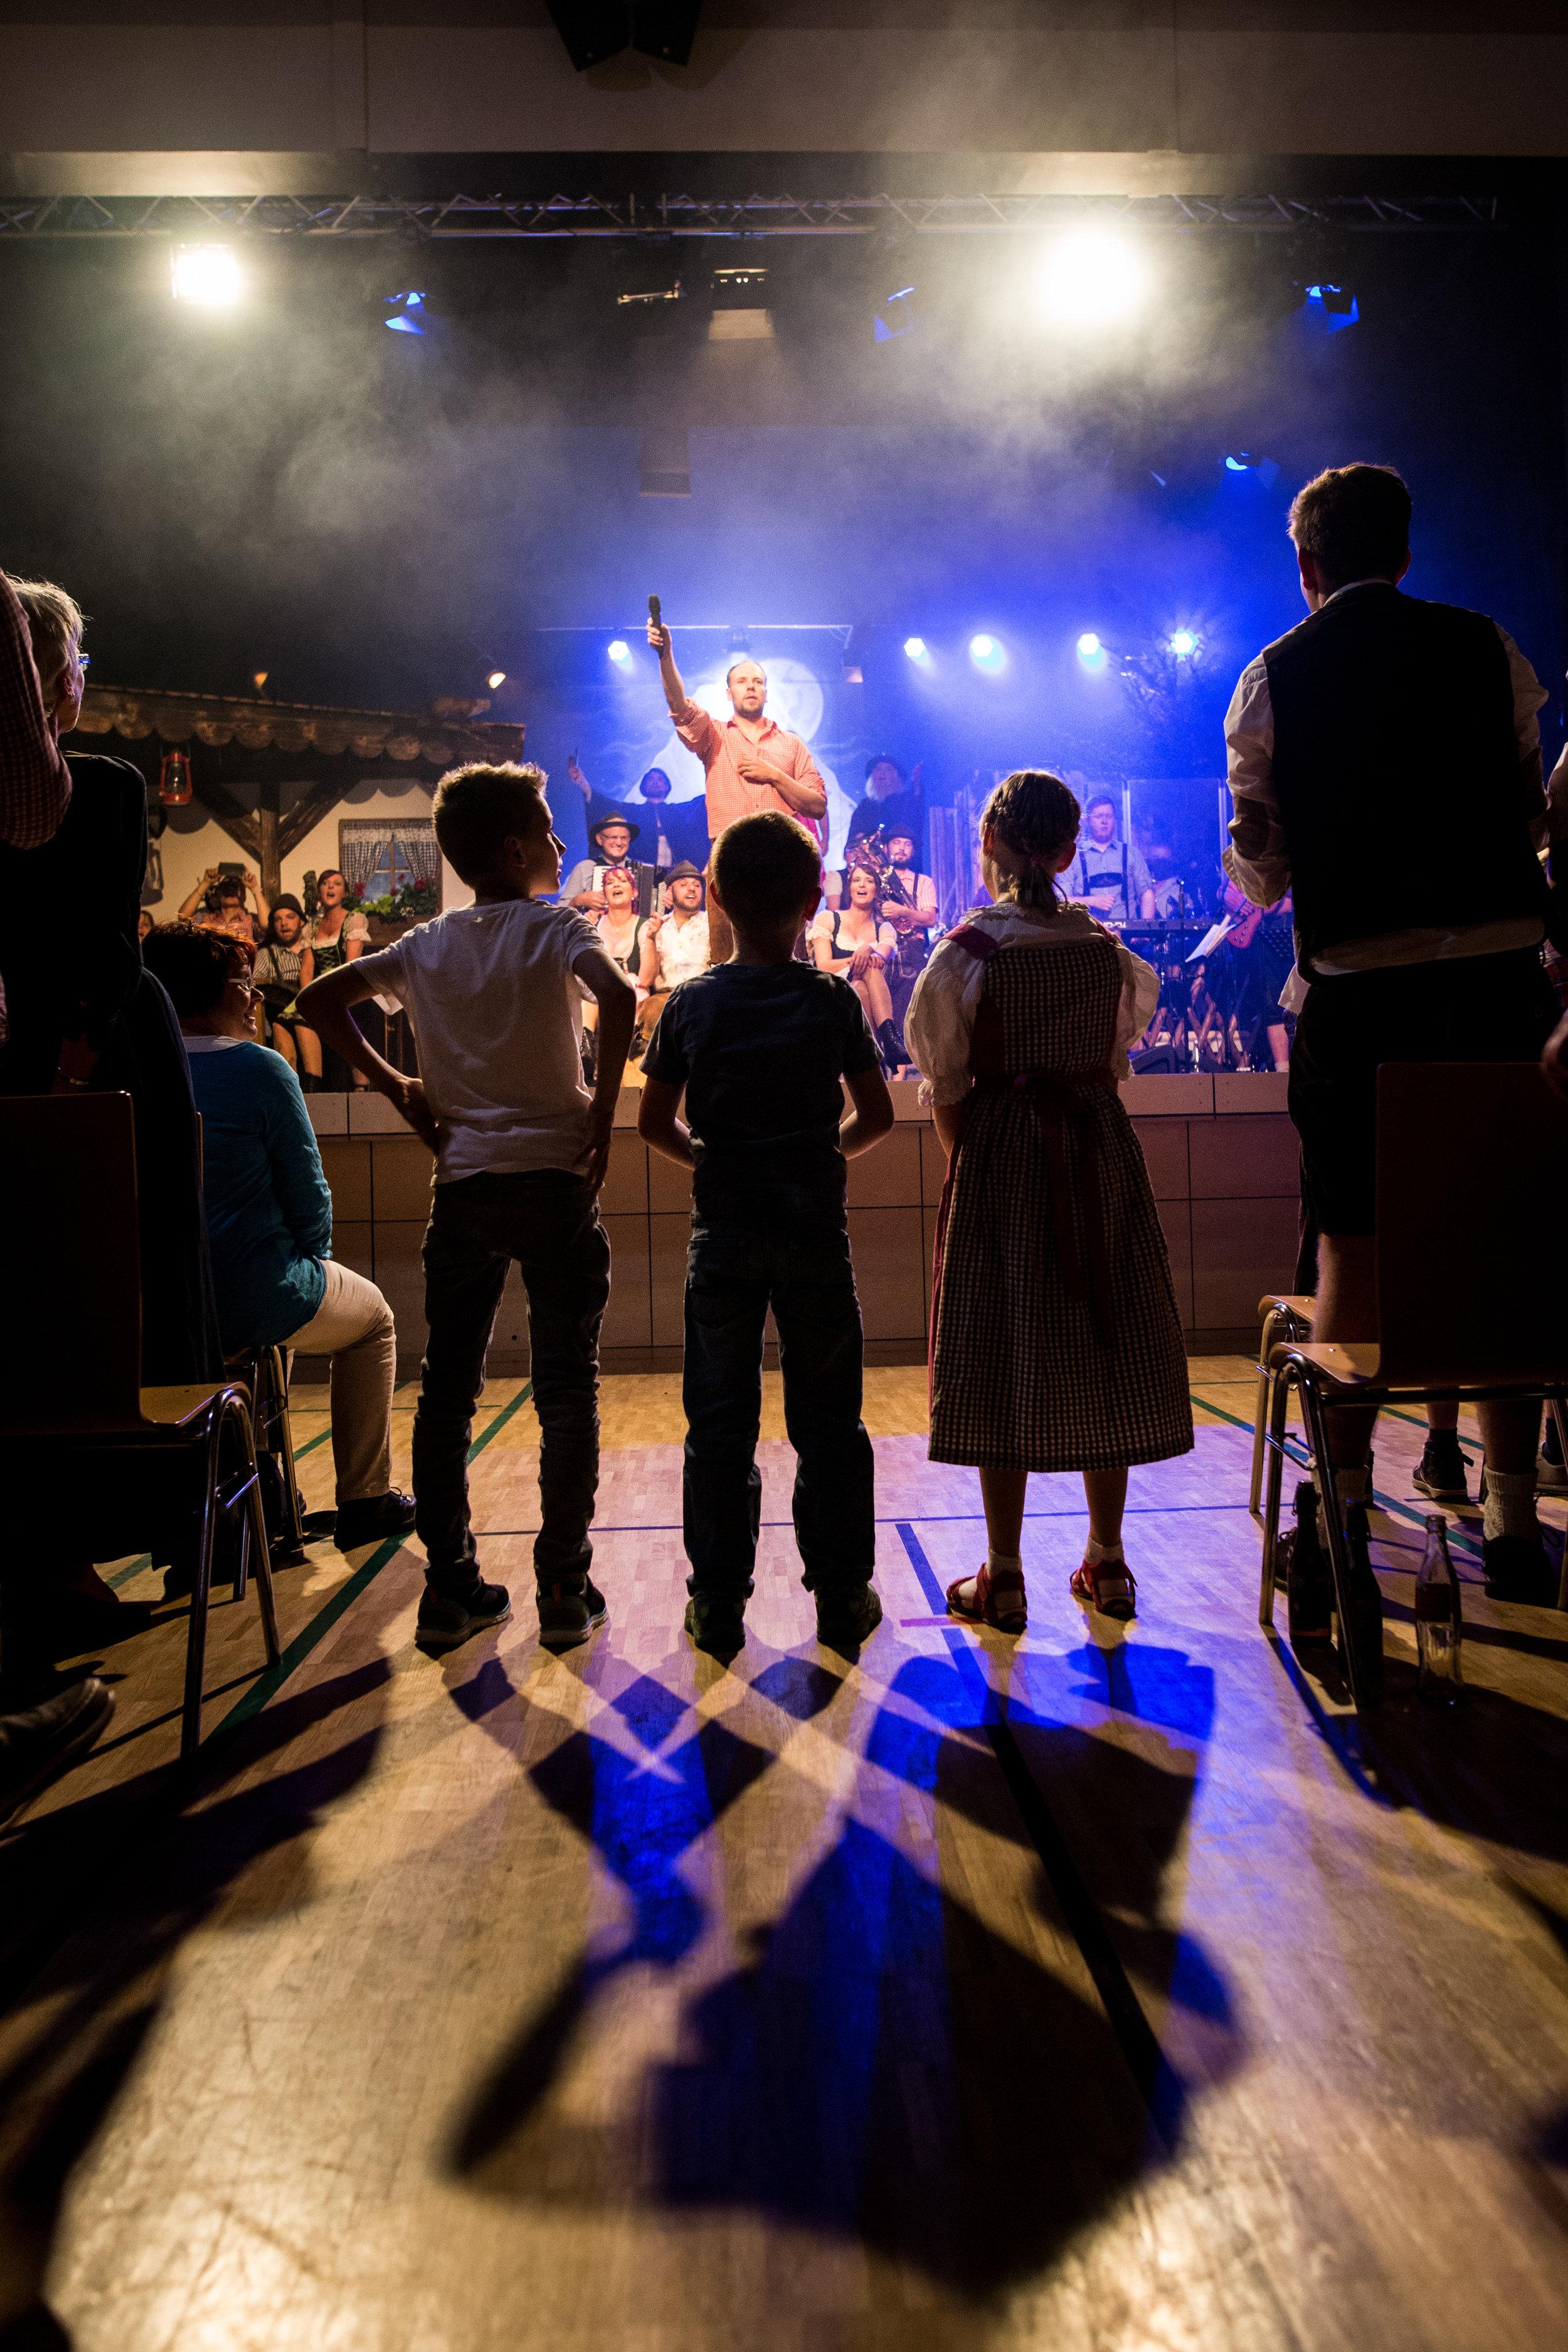 TobiasZistererPhoto_20170524_MusiktheaterGosheim_Watzmann2017_0178L.jpg